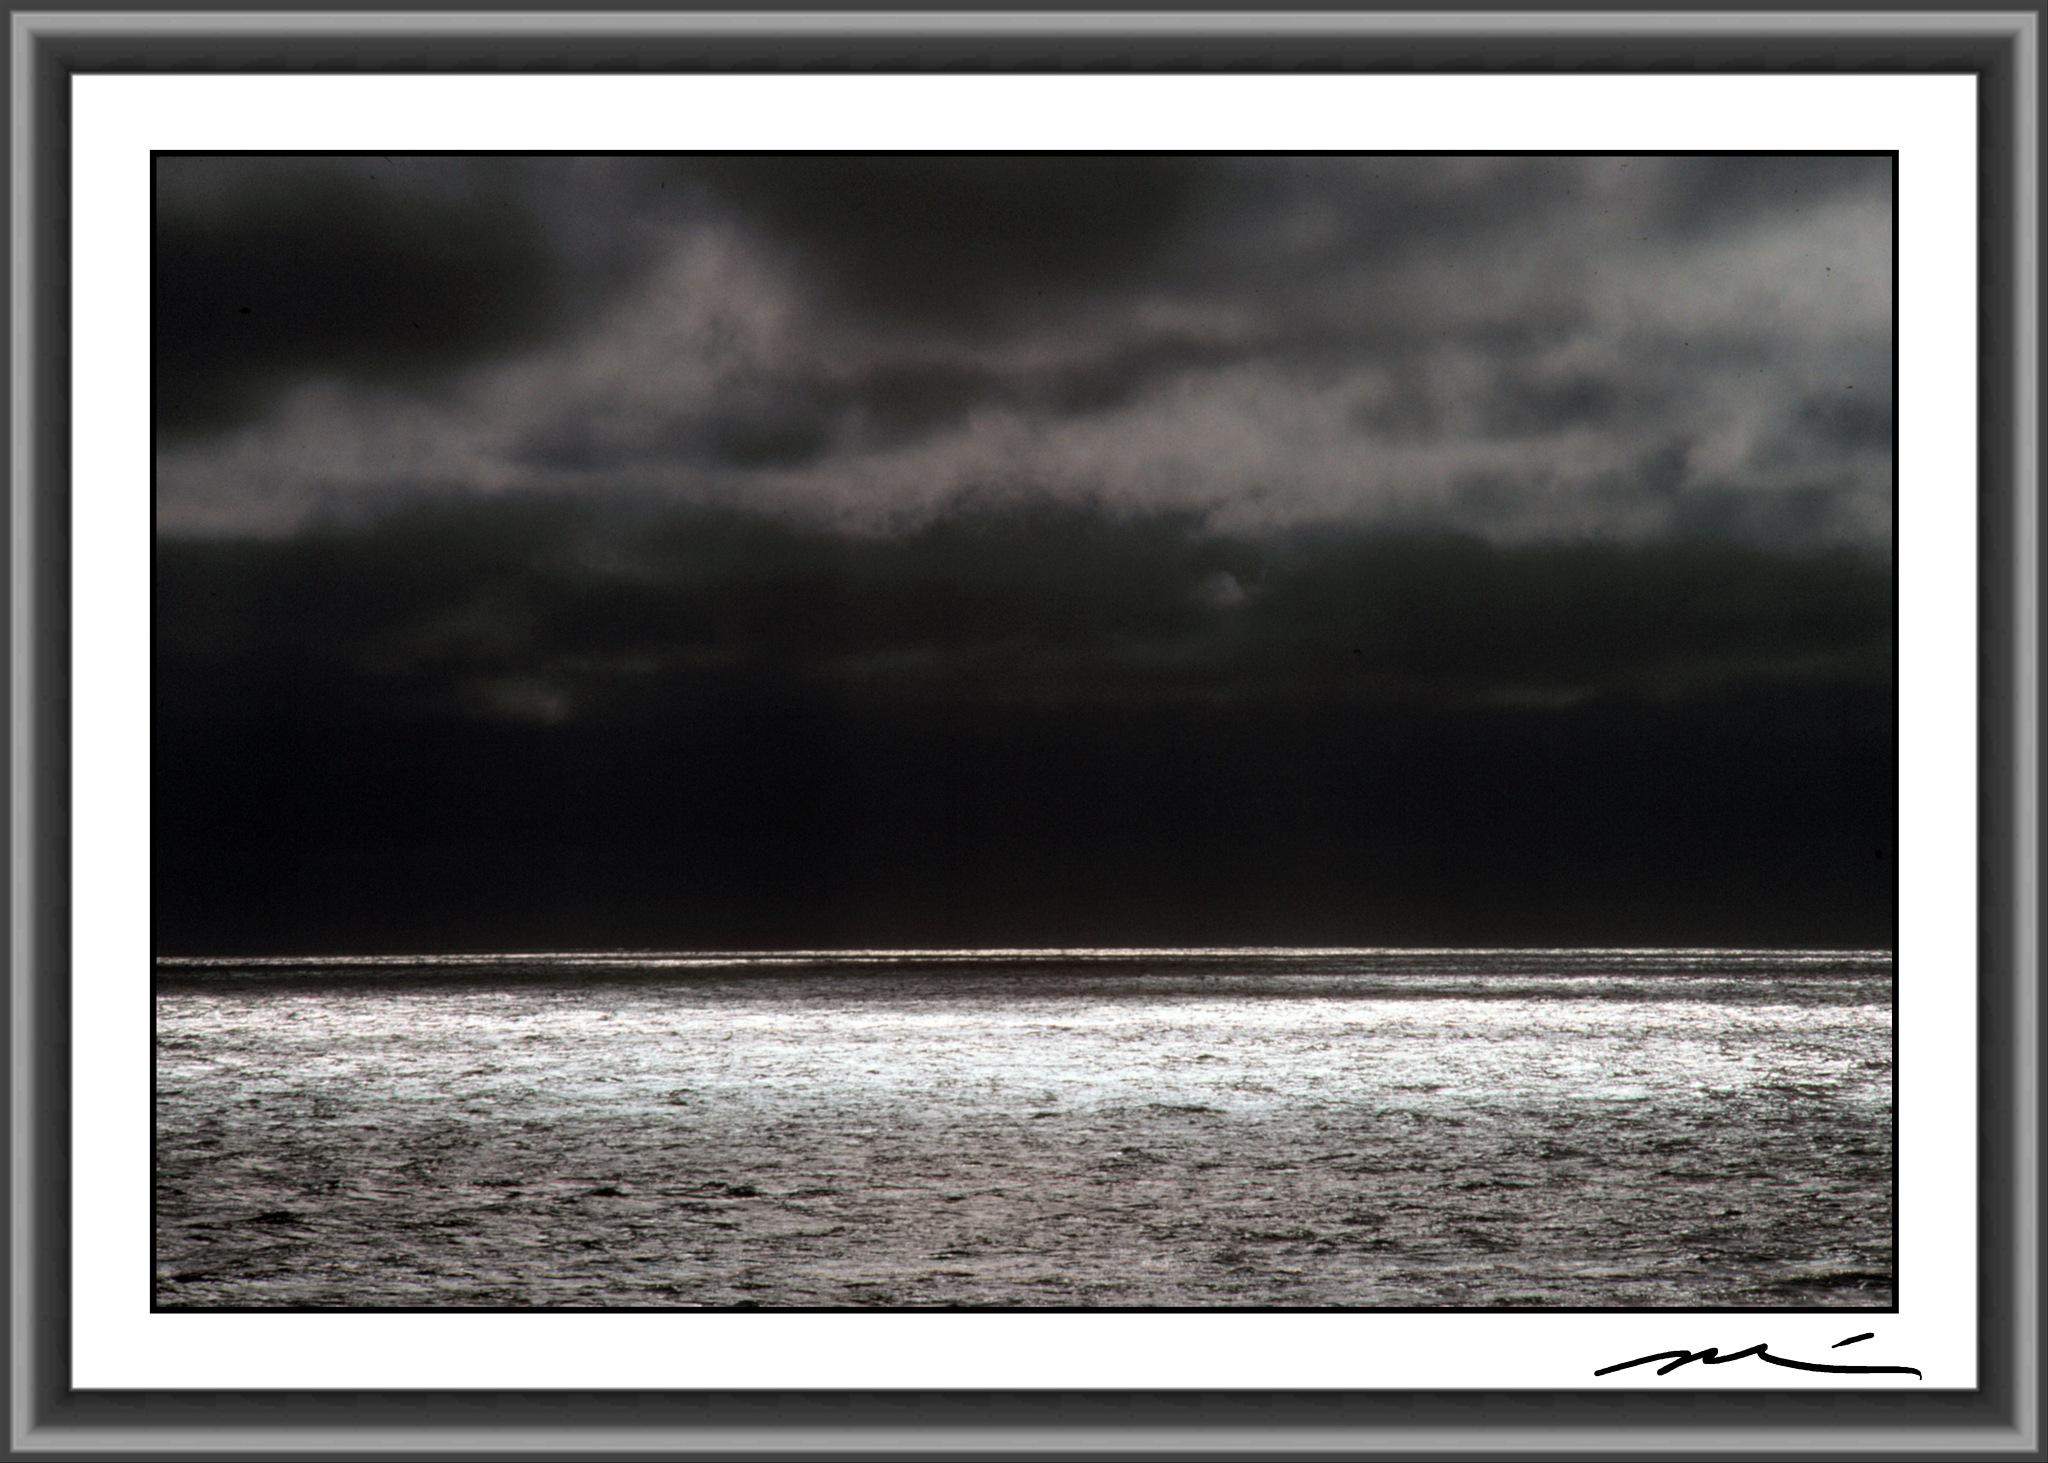 Darkening Skies Over A Shimmering Sea by Michael D. Davis